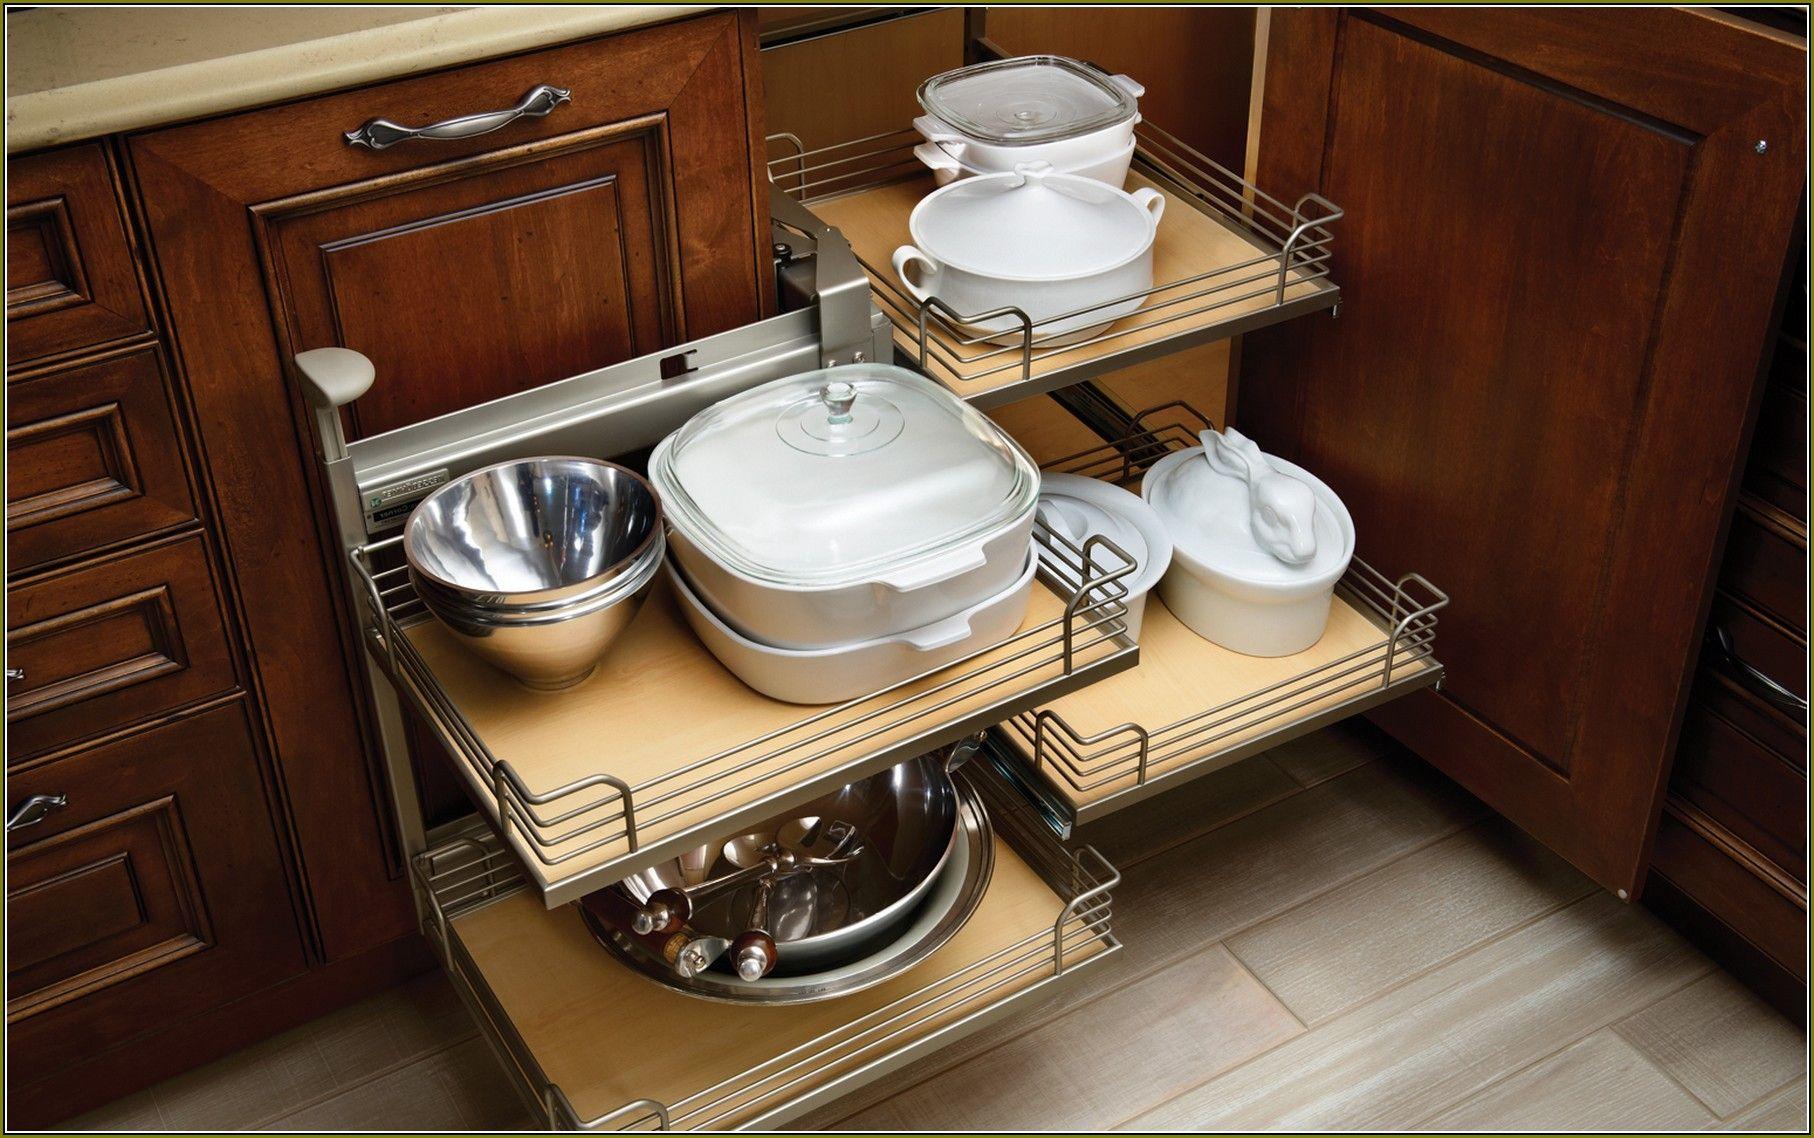 kitchen cabinet lazy susan best of blind corner cabinet lazy susan home design ideas and on kitchen organization lazy susan cabinet id=39560